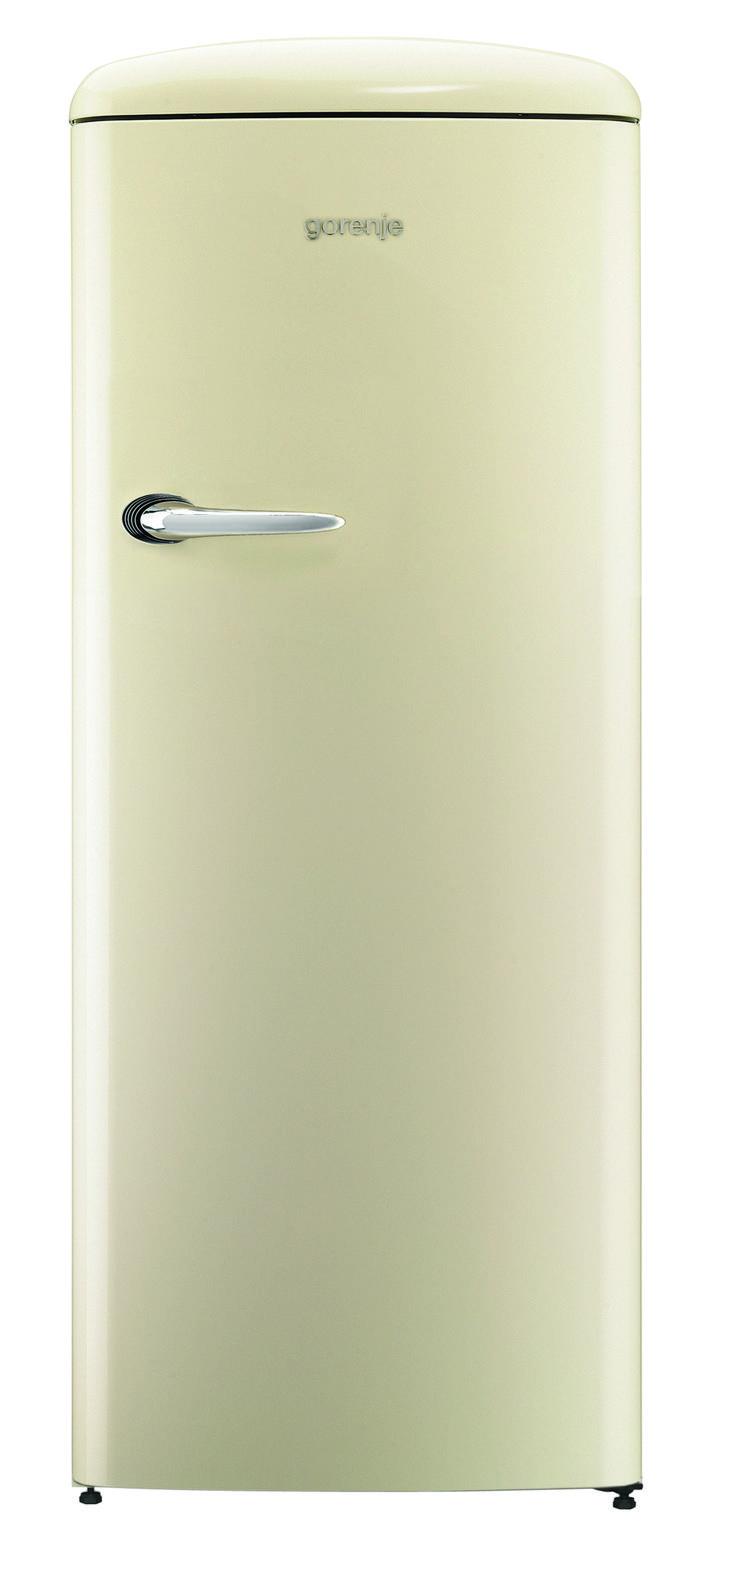 12 best kühlschrank images on Pinterest | Refrigerator ...